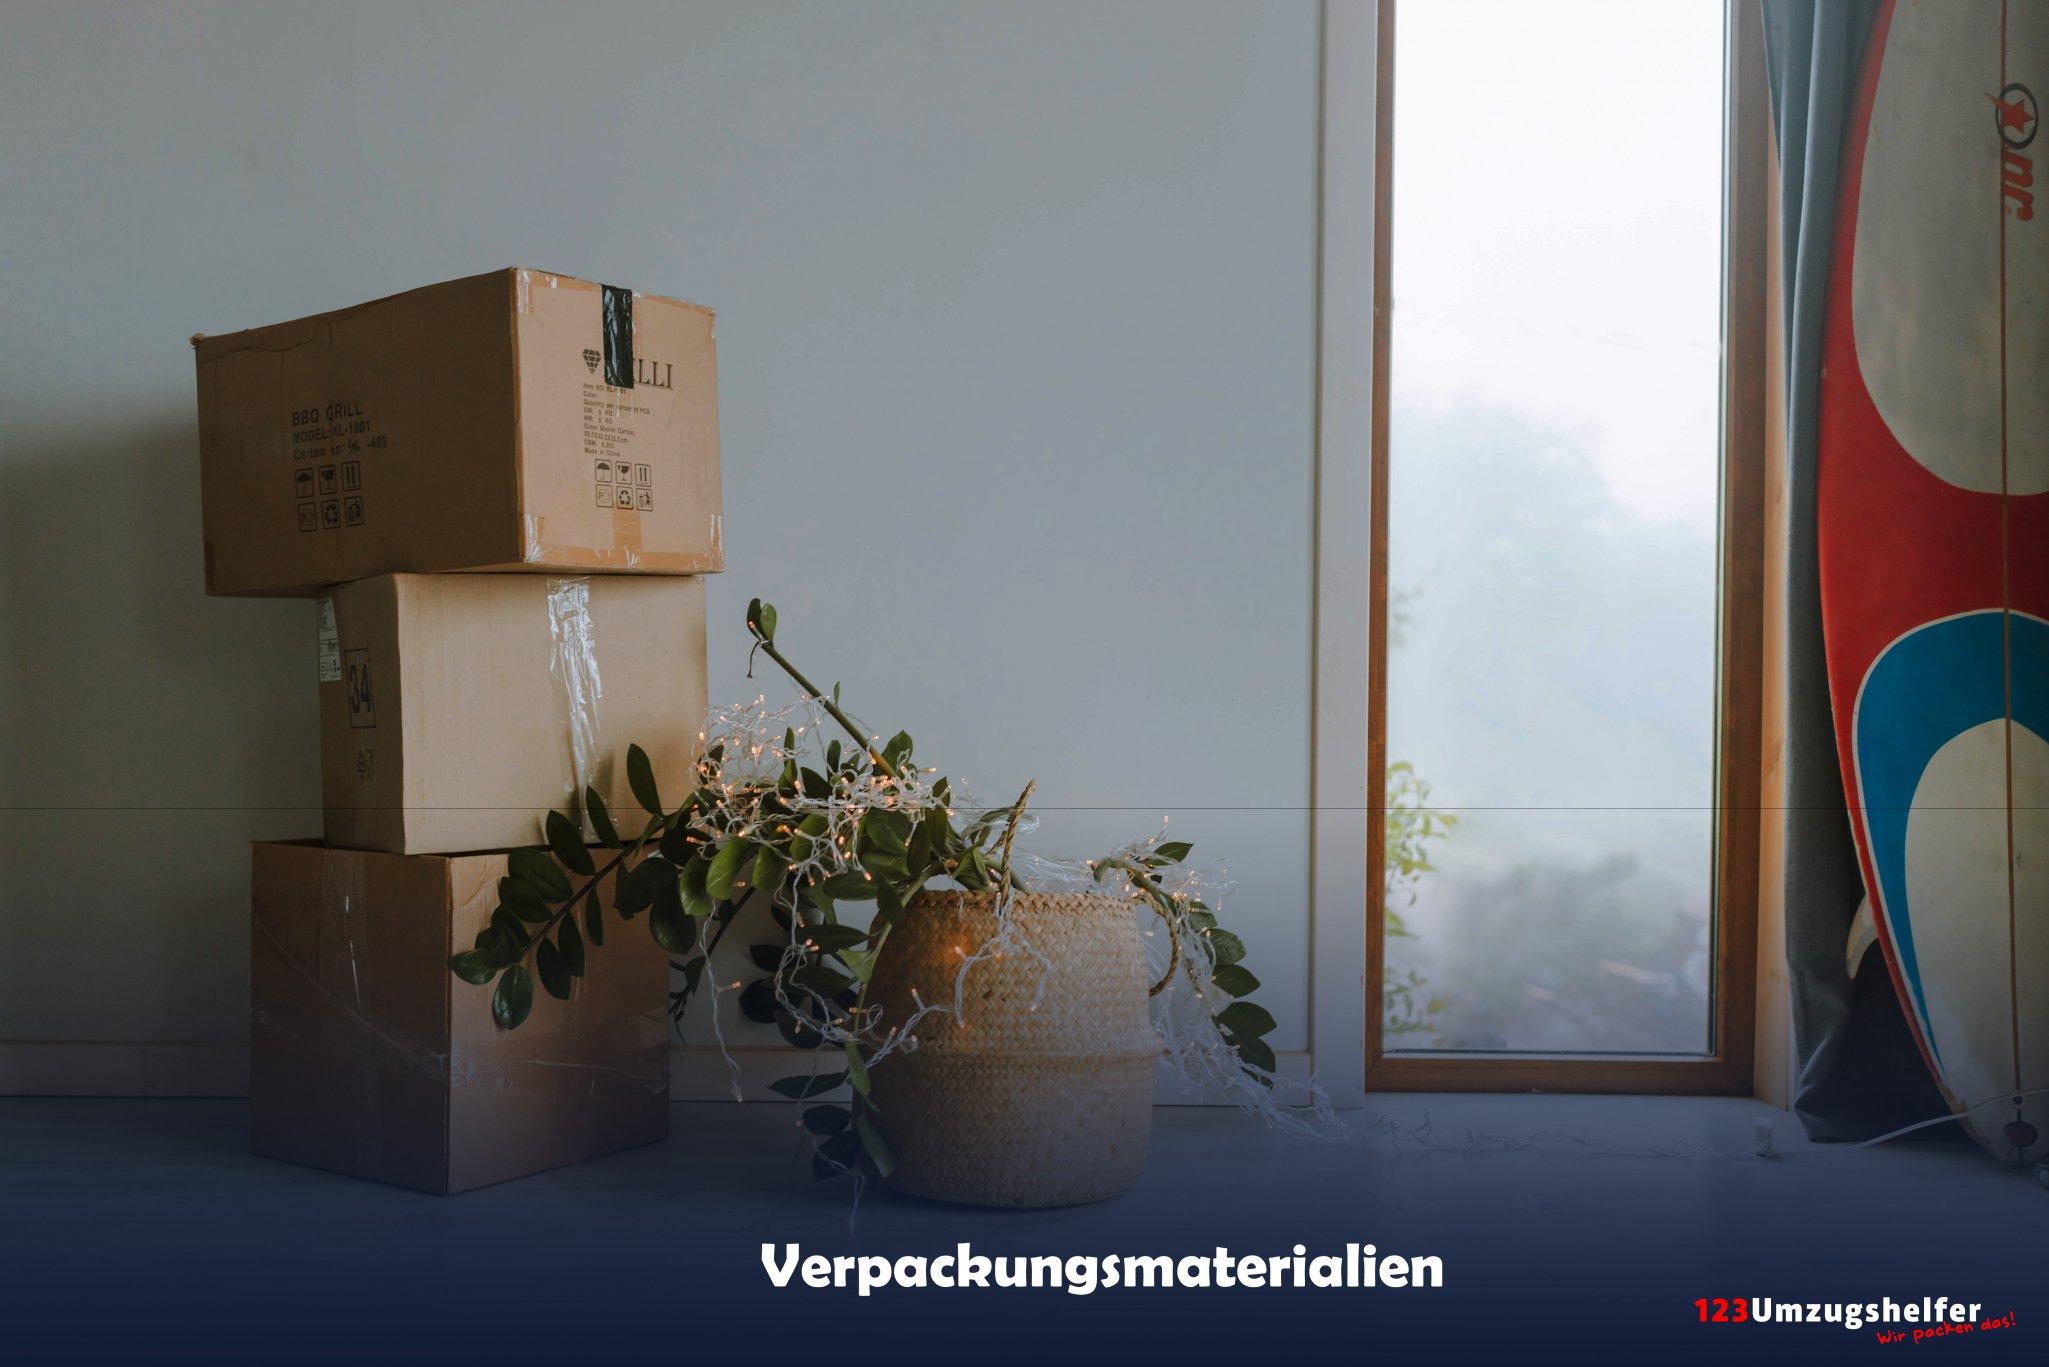 Verpackungsmaterialien Photo